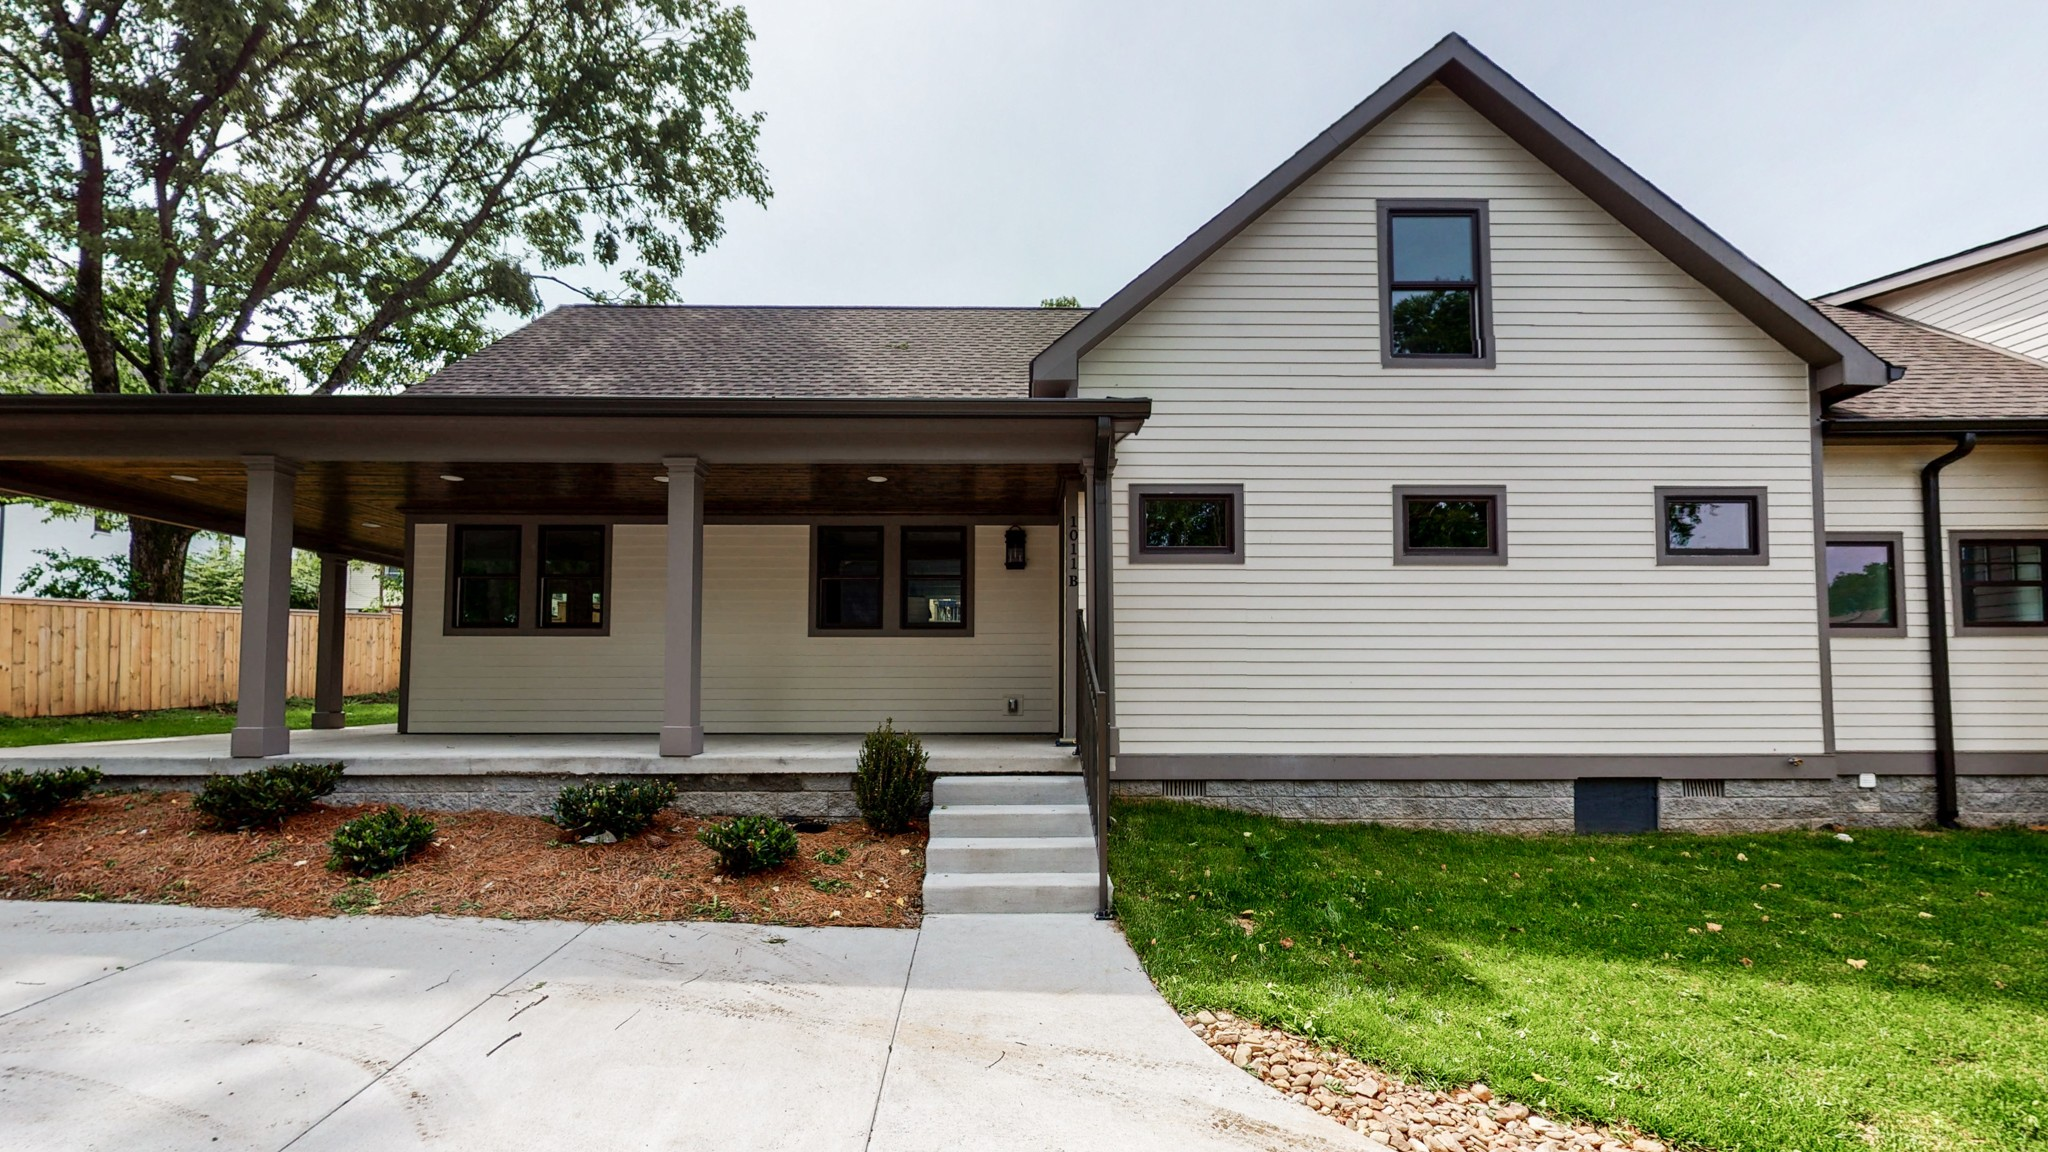 1011B S Douglas Ave Property Photo - Nashville, TN real estate listing